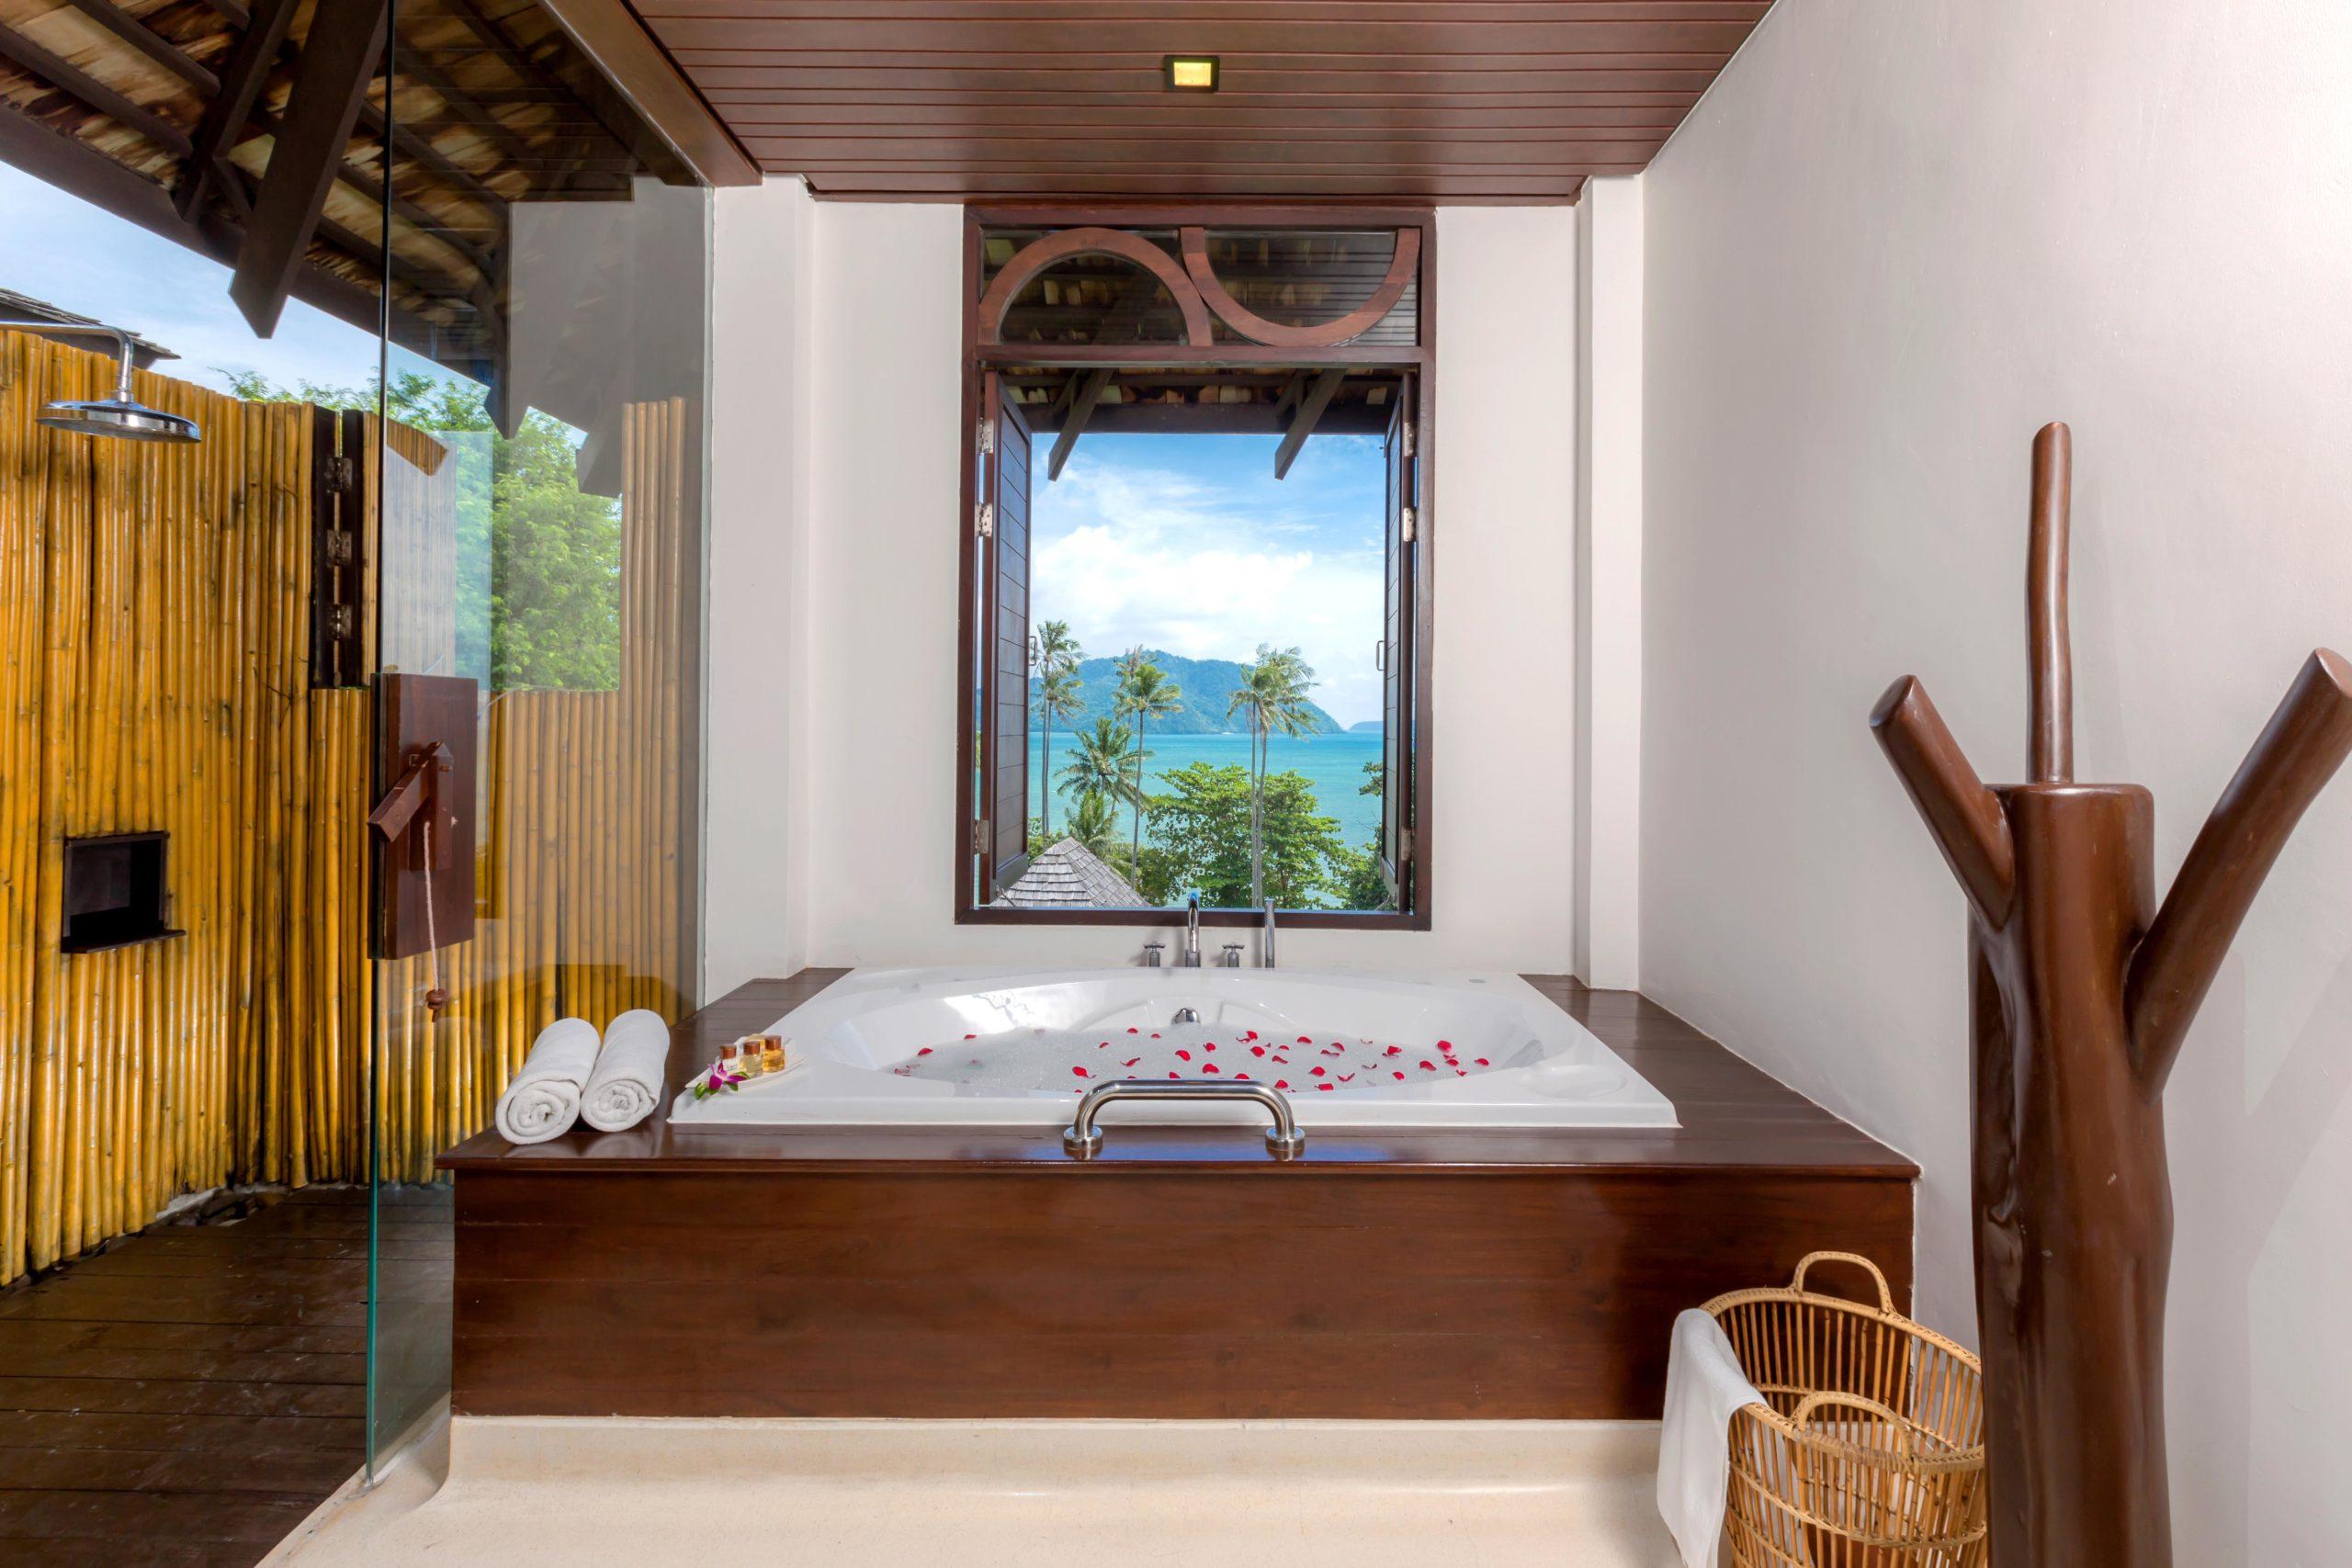 006_Deluxe Seaview Villa_Bathroom The Vijitt Resort Phuket